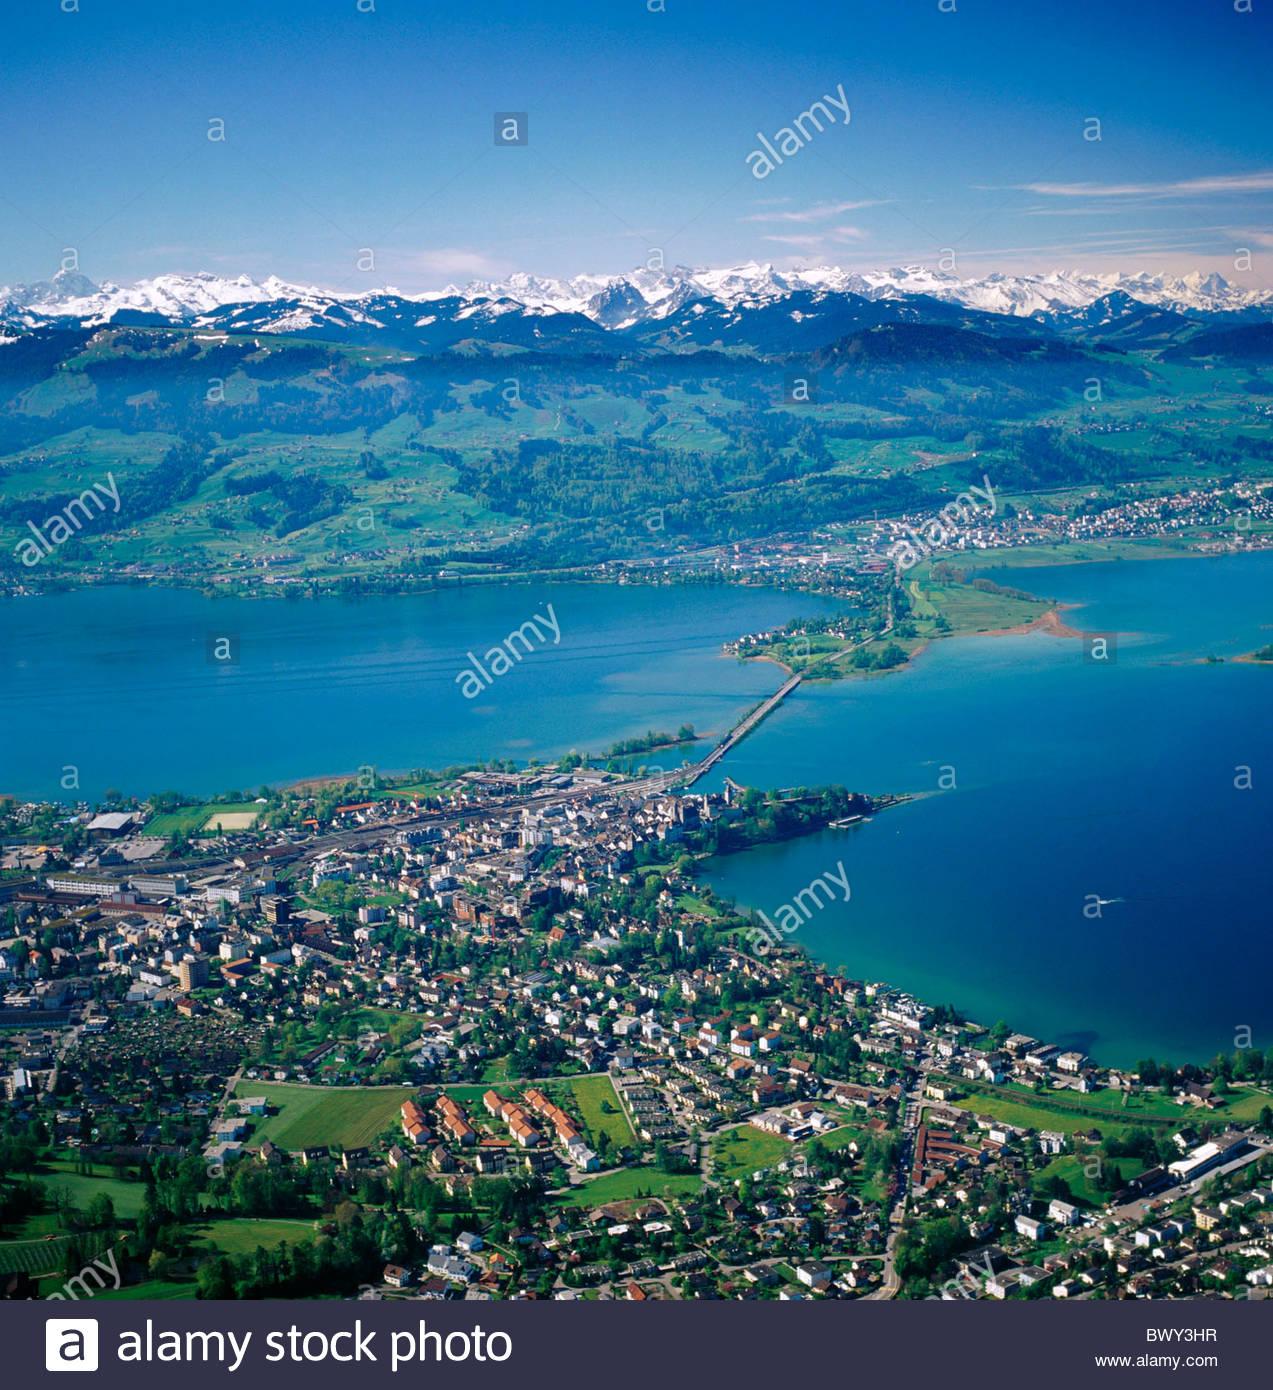 Scenery zurich lake sea alps aerial photo aerial view for Innendekoration pfaffikon zh